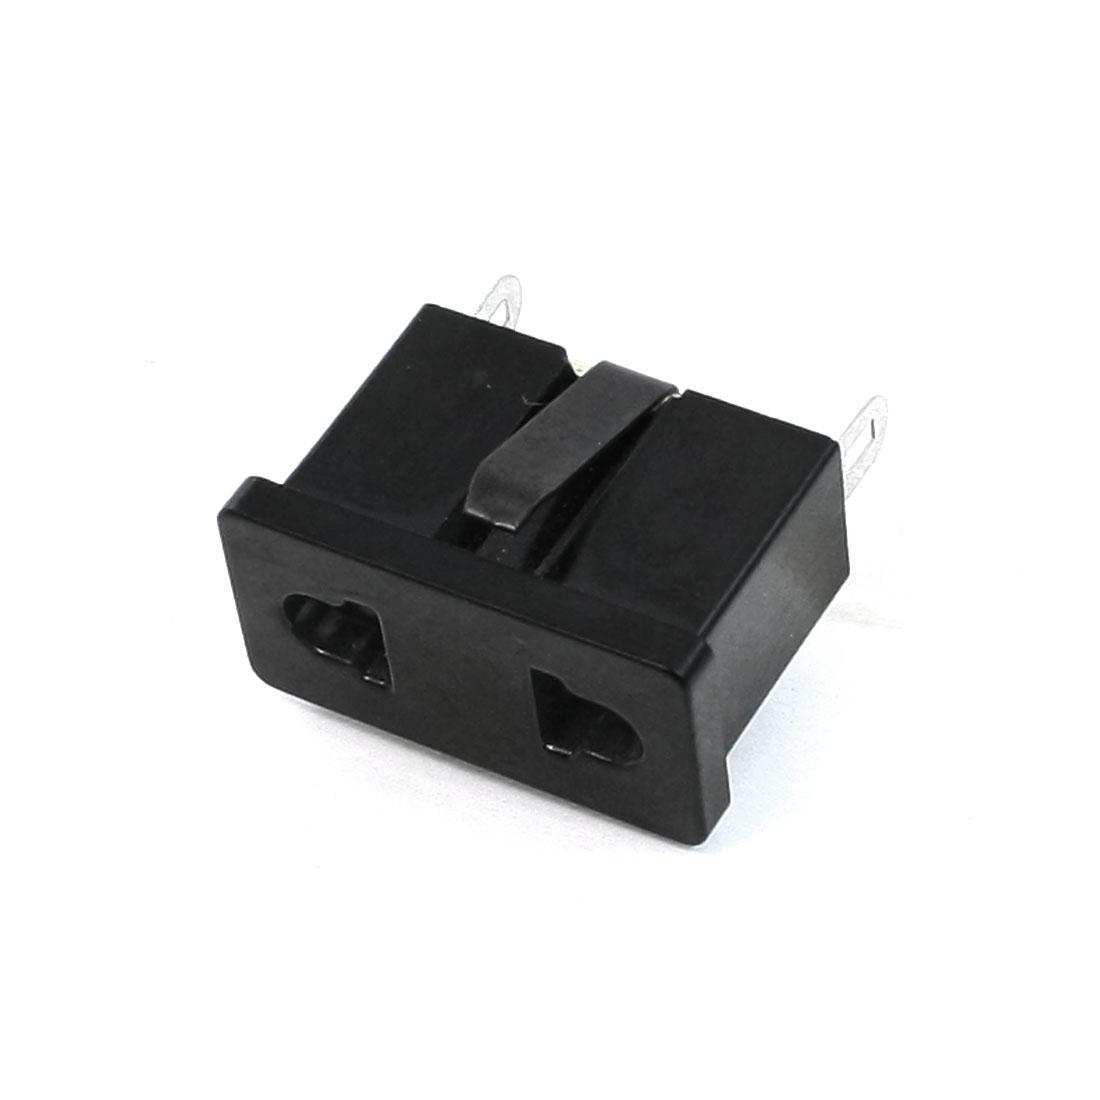 AC 125V/250V 6A 2 Pin Female Connector Power Socket for US EU Plug